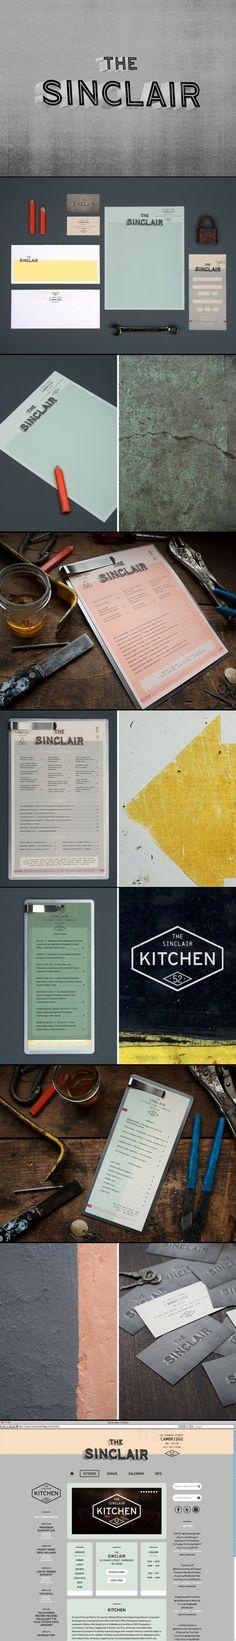 #sinclair #kitchen #branding | #stationary #corporate #design #corporatedesign #identity #branding #marketing < repinned by www.BlickeDeeler.de | Visit our website: www.blickedeeler.de/leistungen/corporate-design